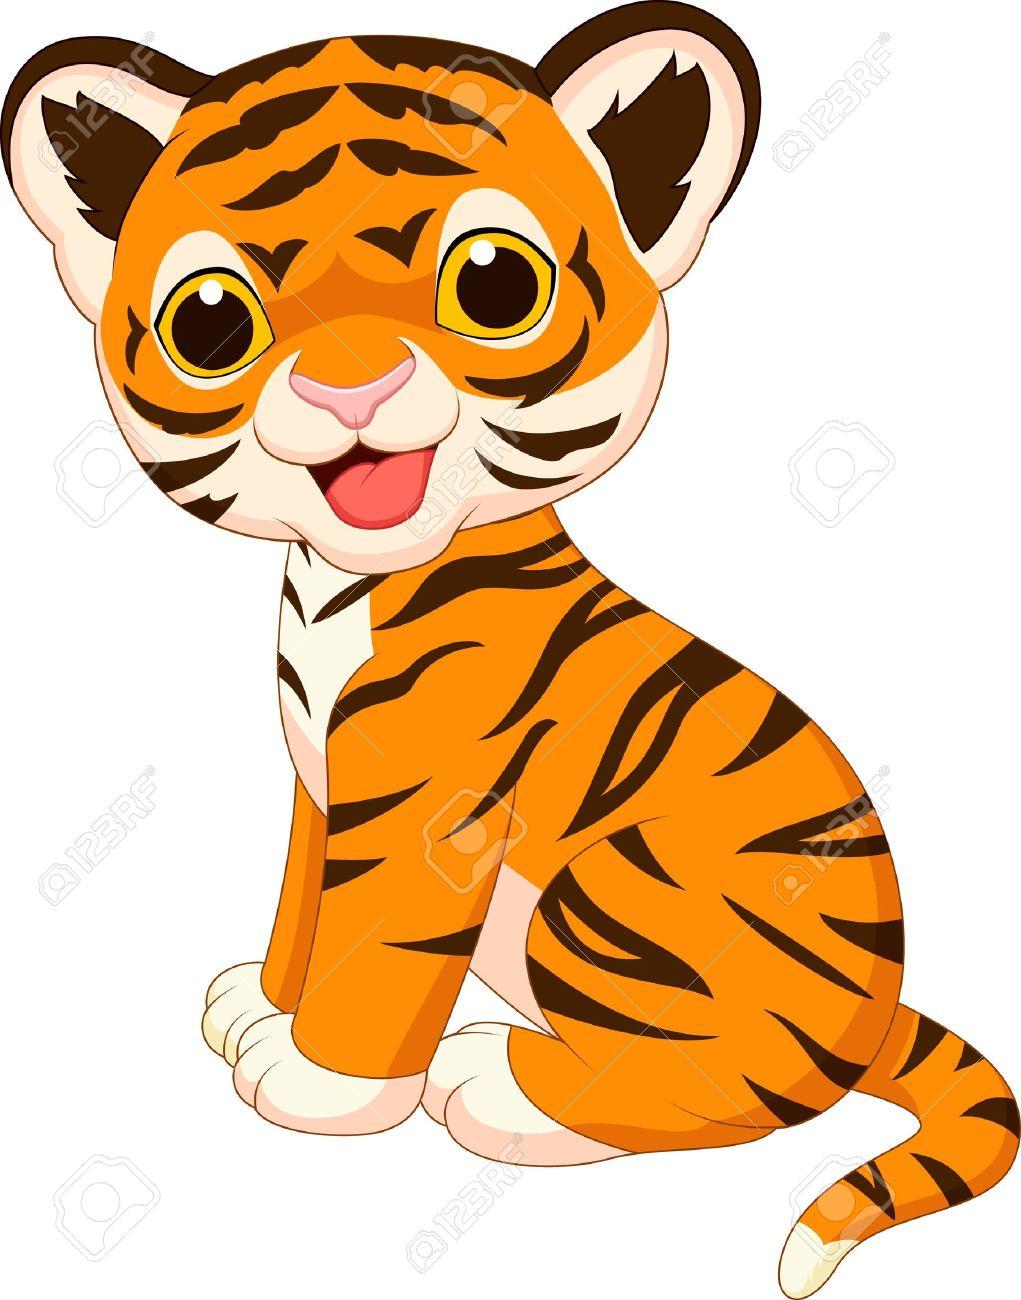 323e3e49a 38,915 Tiger Stock Vector Illustration And Royalty Free Tiger Clipart